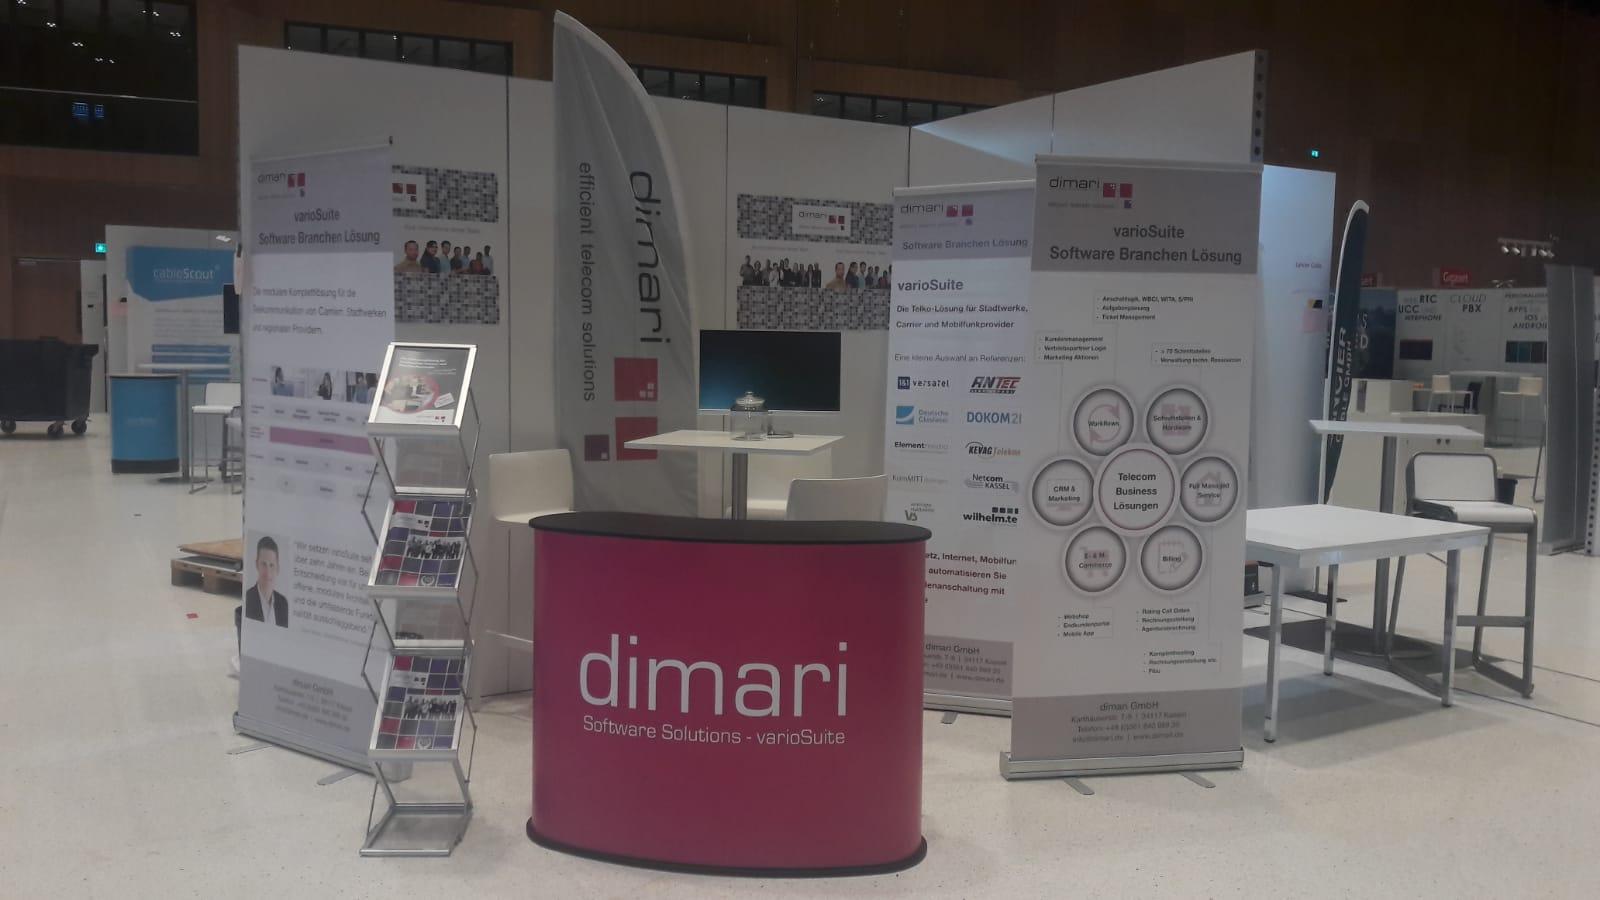 dimari-fiberdays19-stand